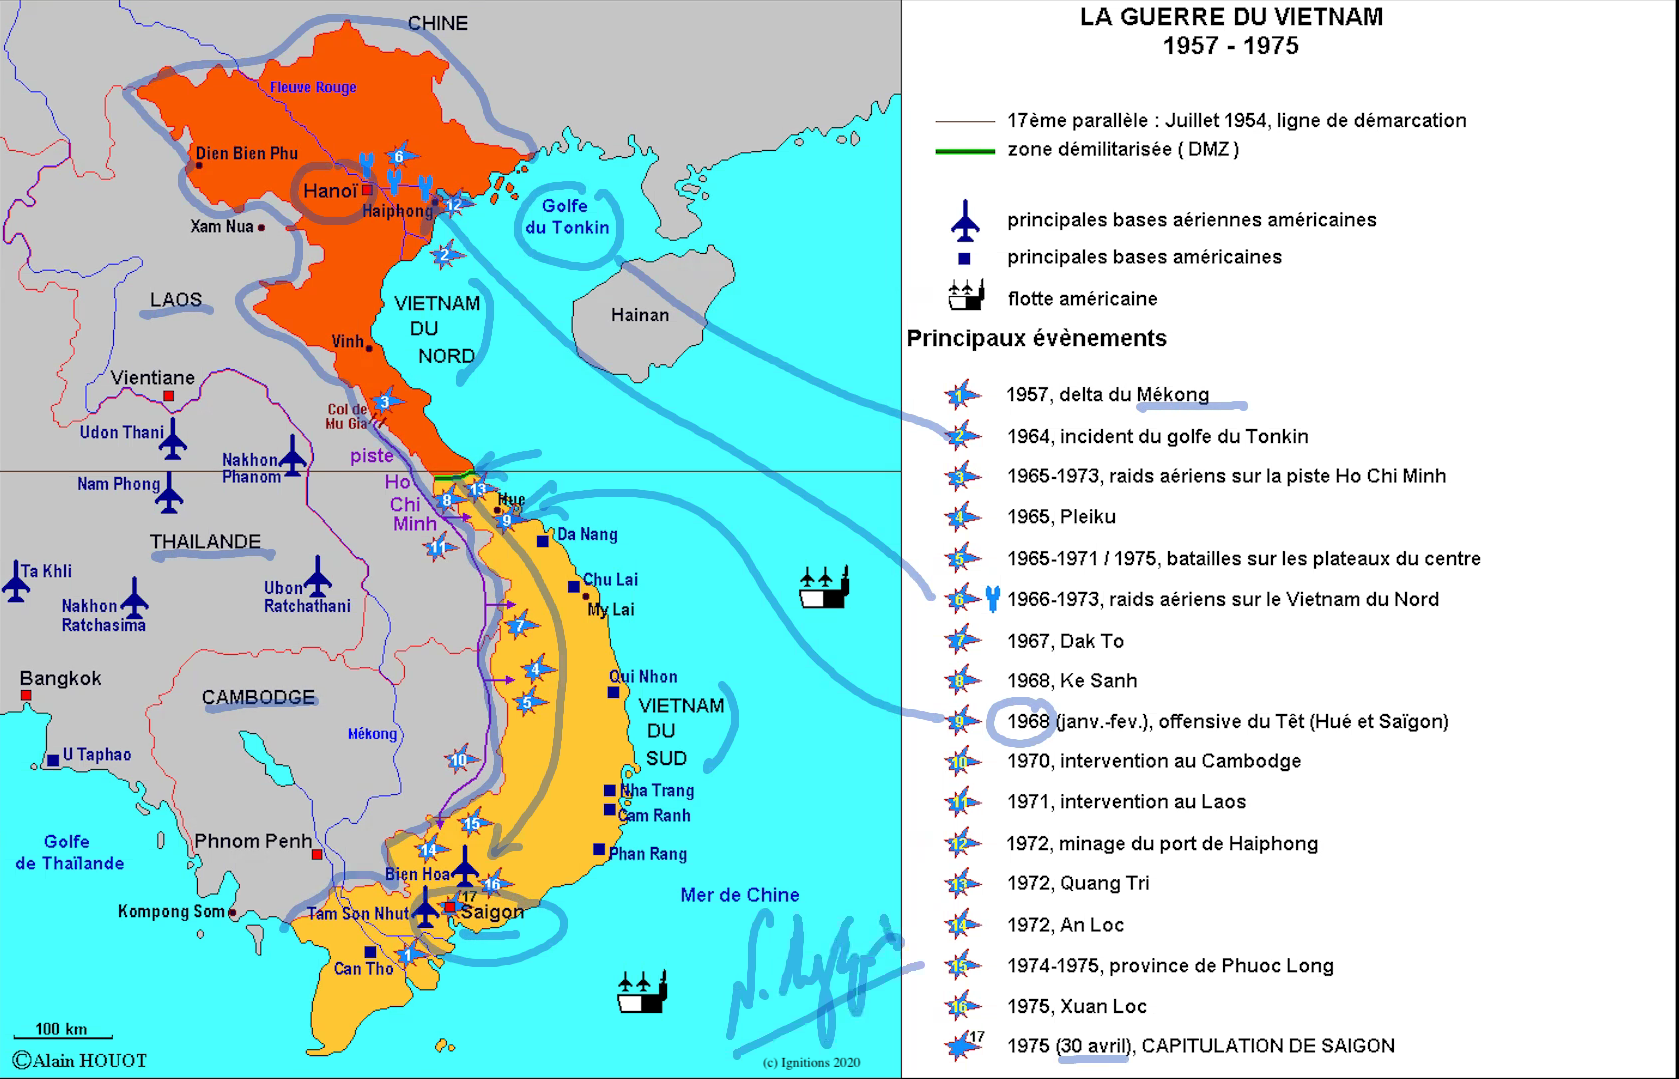 55893 - e-Μάθημα IV: Κατεχόμενα στην Ασία: Κορέα και Βιετνάμ. (Dessin)